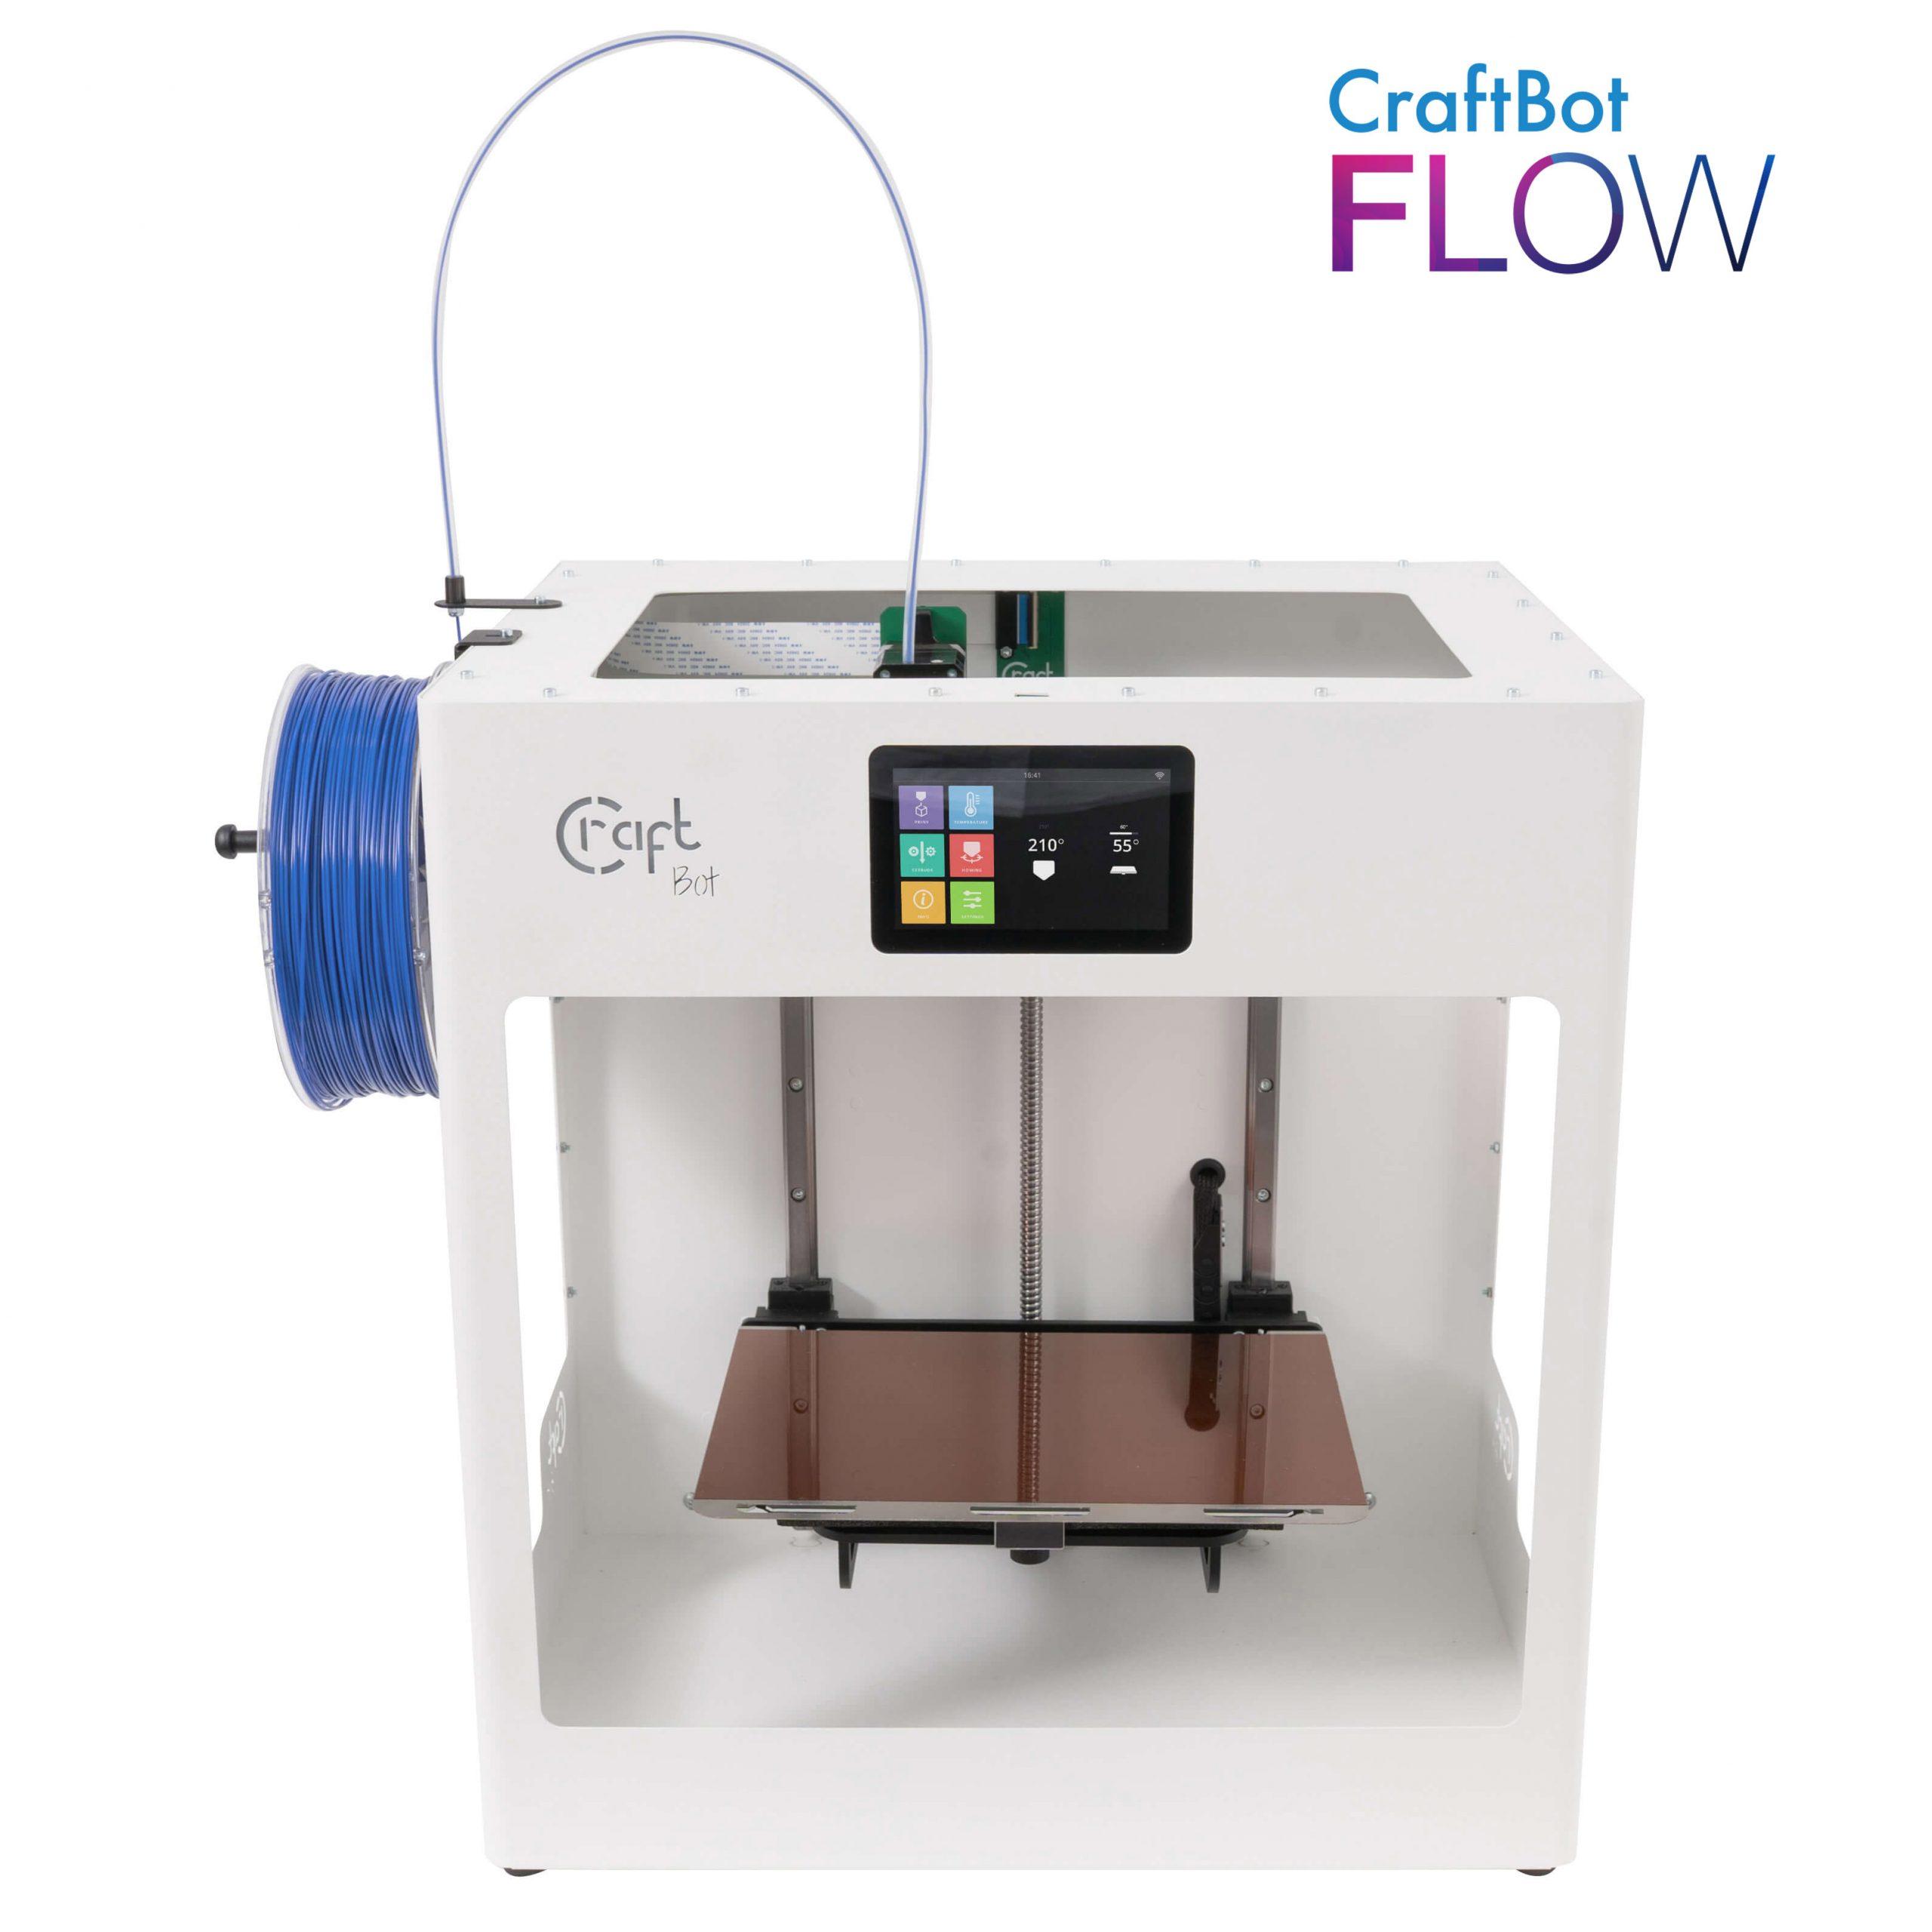 craftbot-flow-3d-drucker-shop-1.jpg